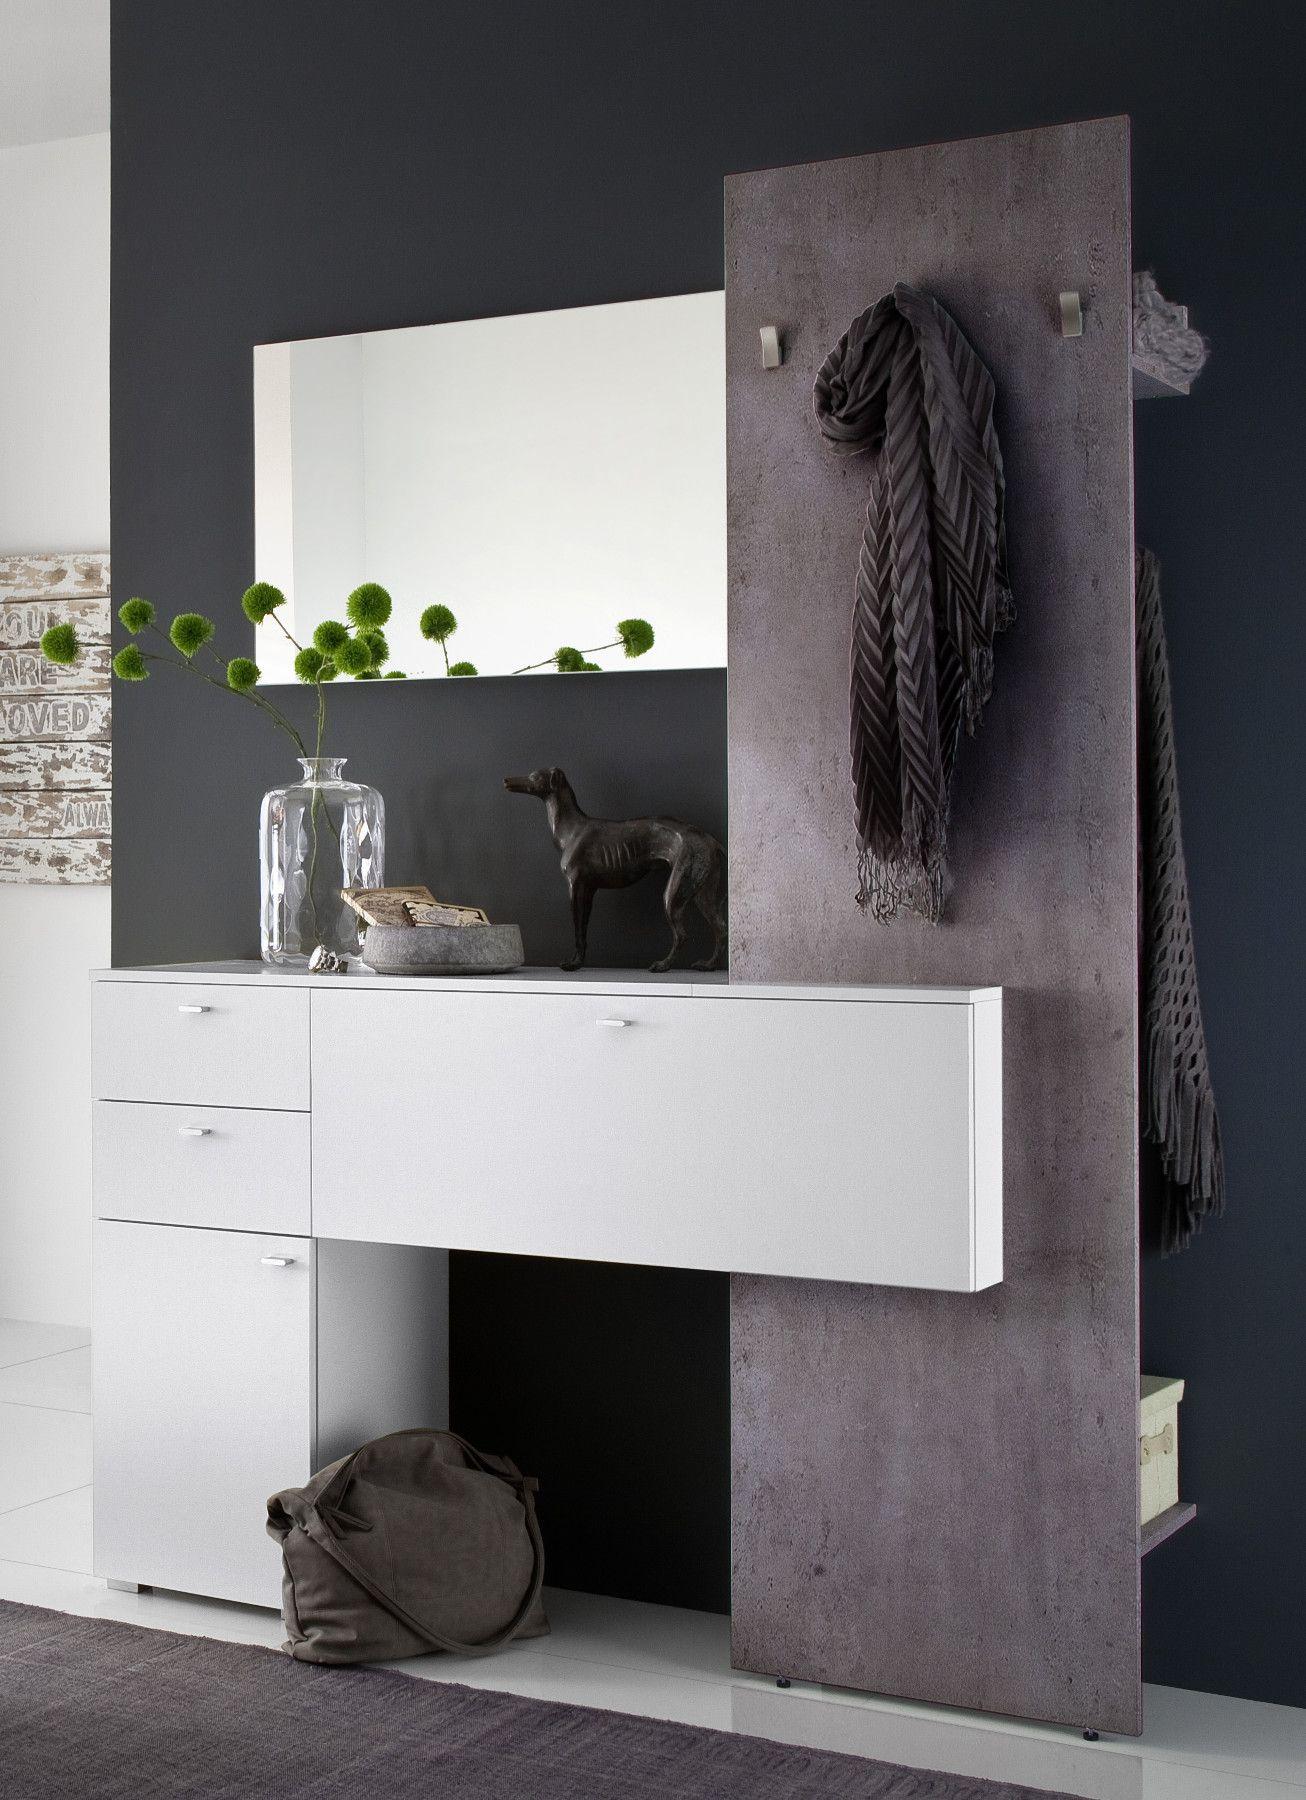 Garderobenset Weiss Betonoptik Scaron3 Designermöbel Moderne